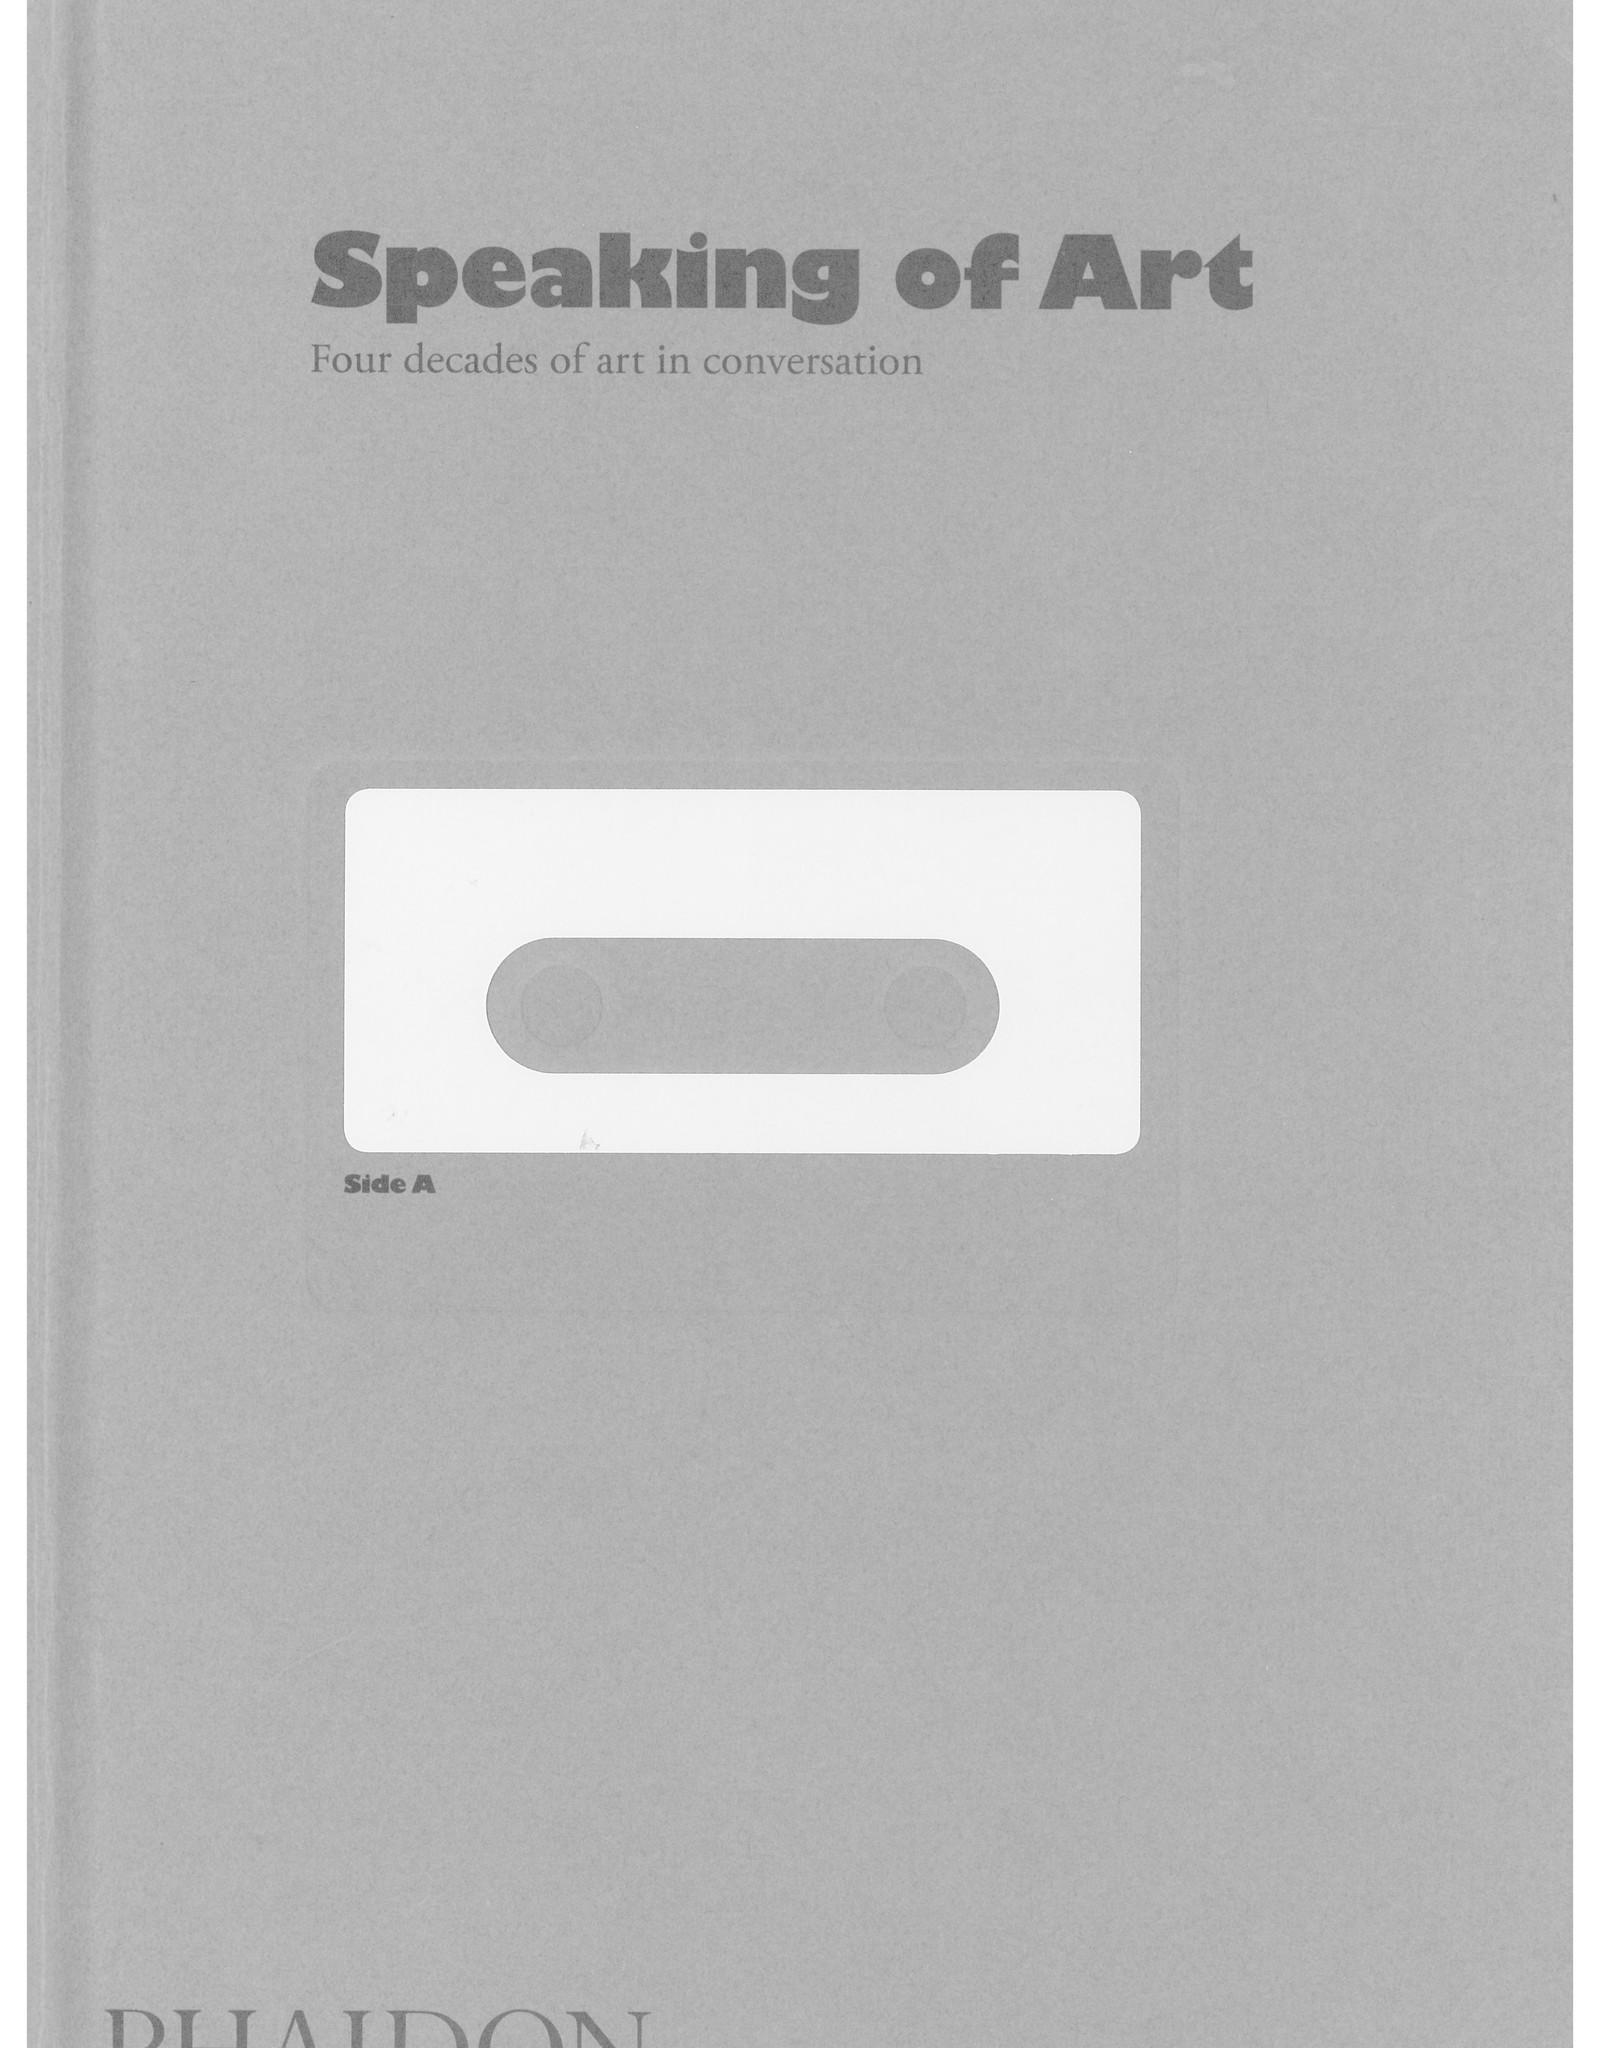 Speaking of Art / William Furlong Phaidon